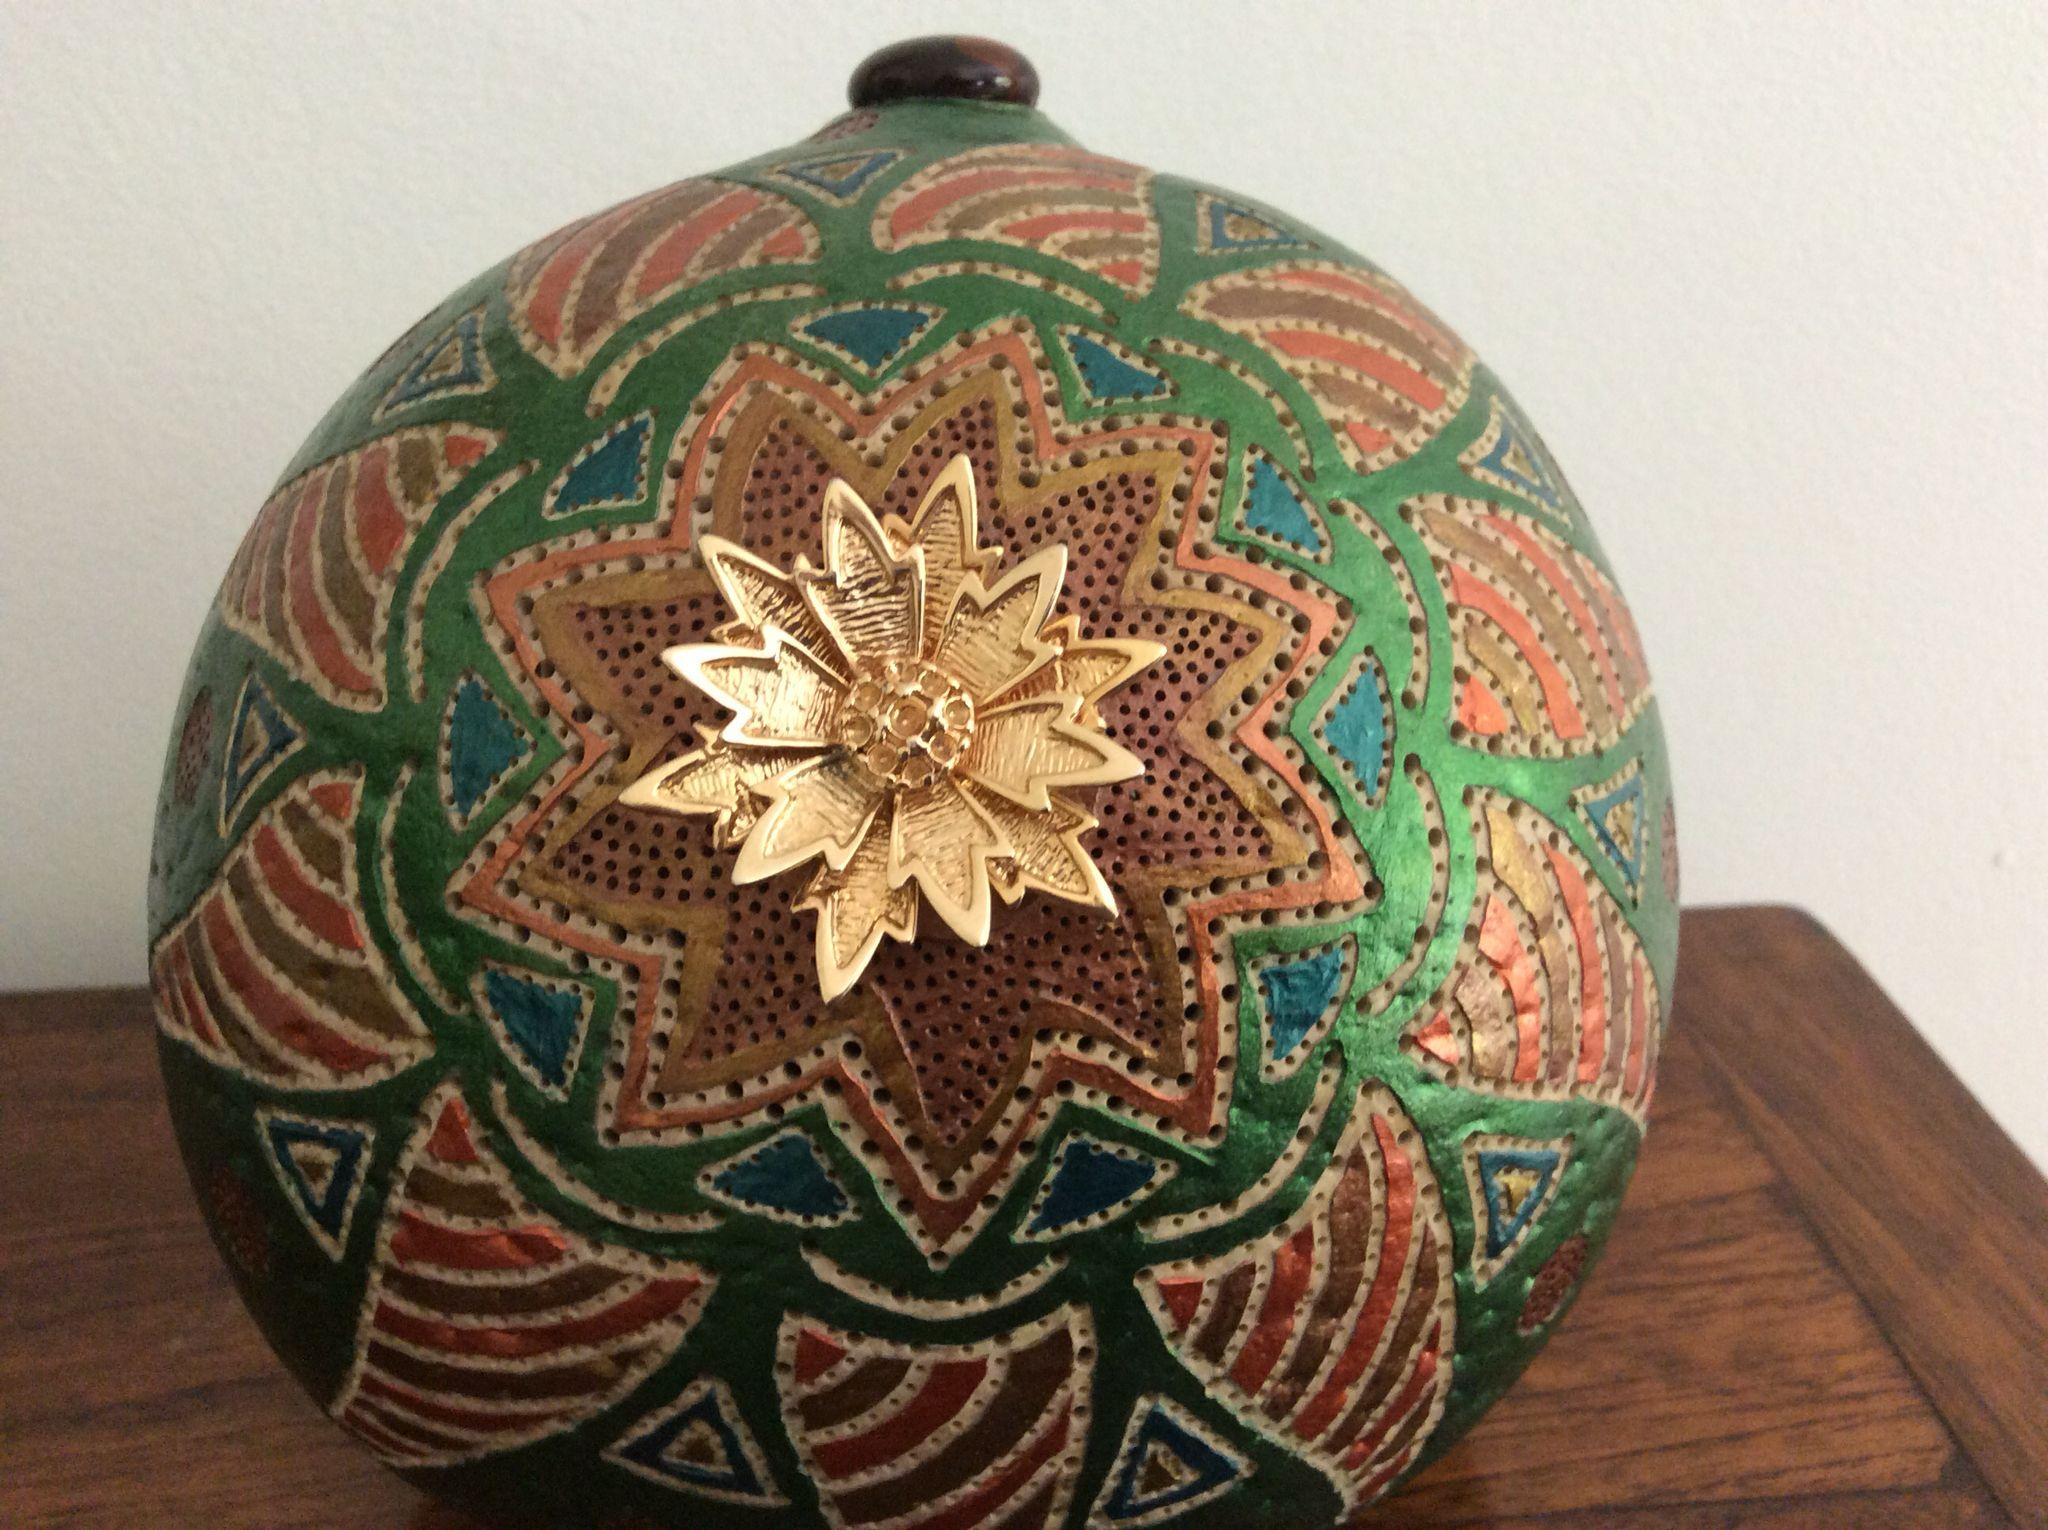 Lampe Calebasse Etoile De Noel Gourd Crafts Pinterest Gourds